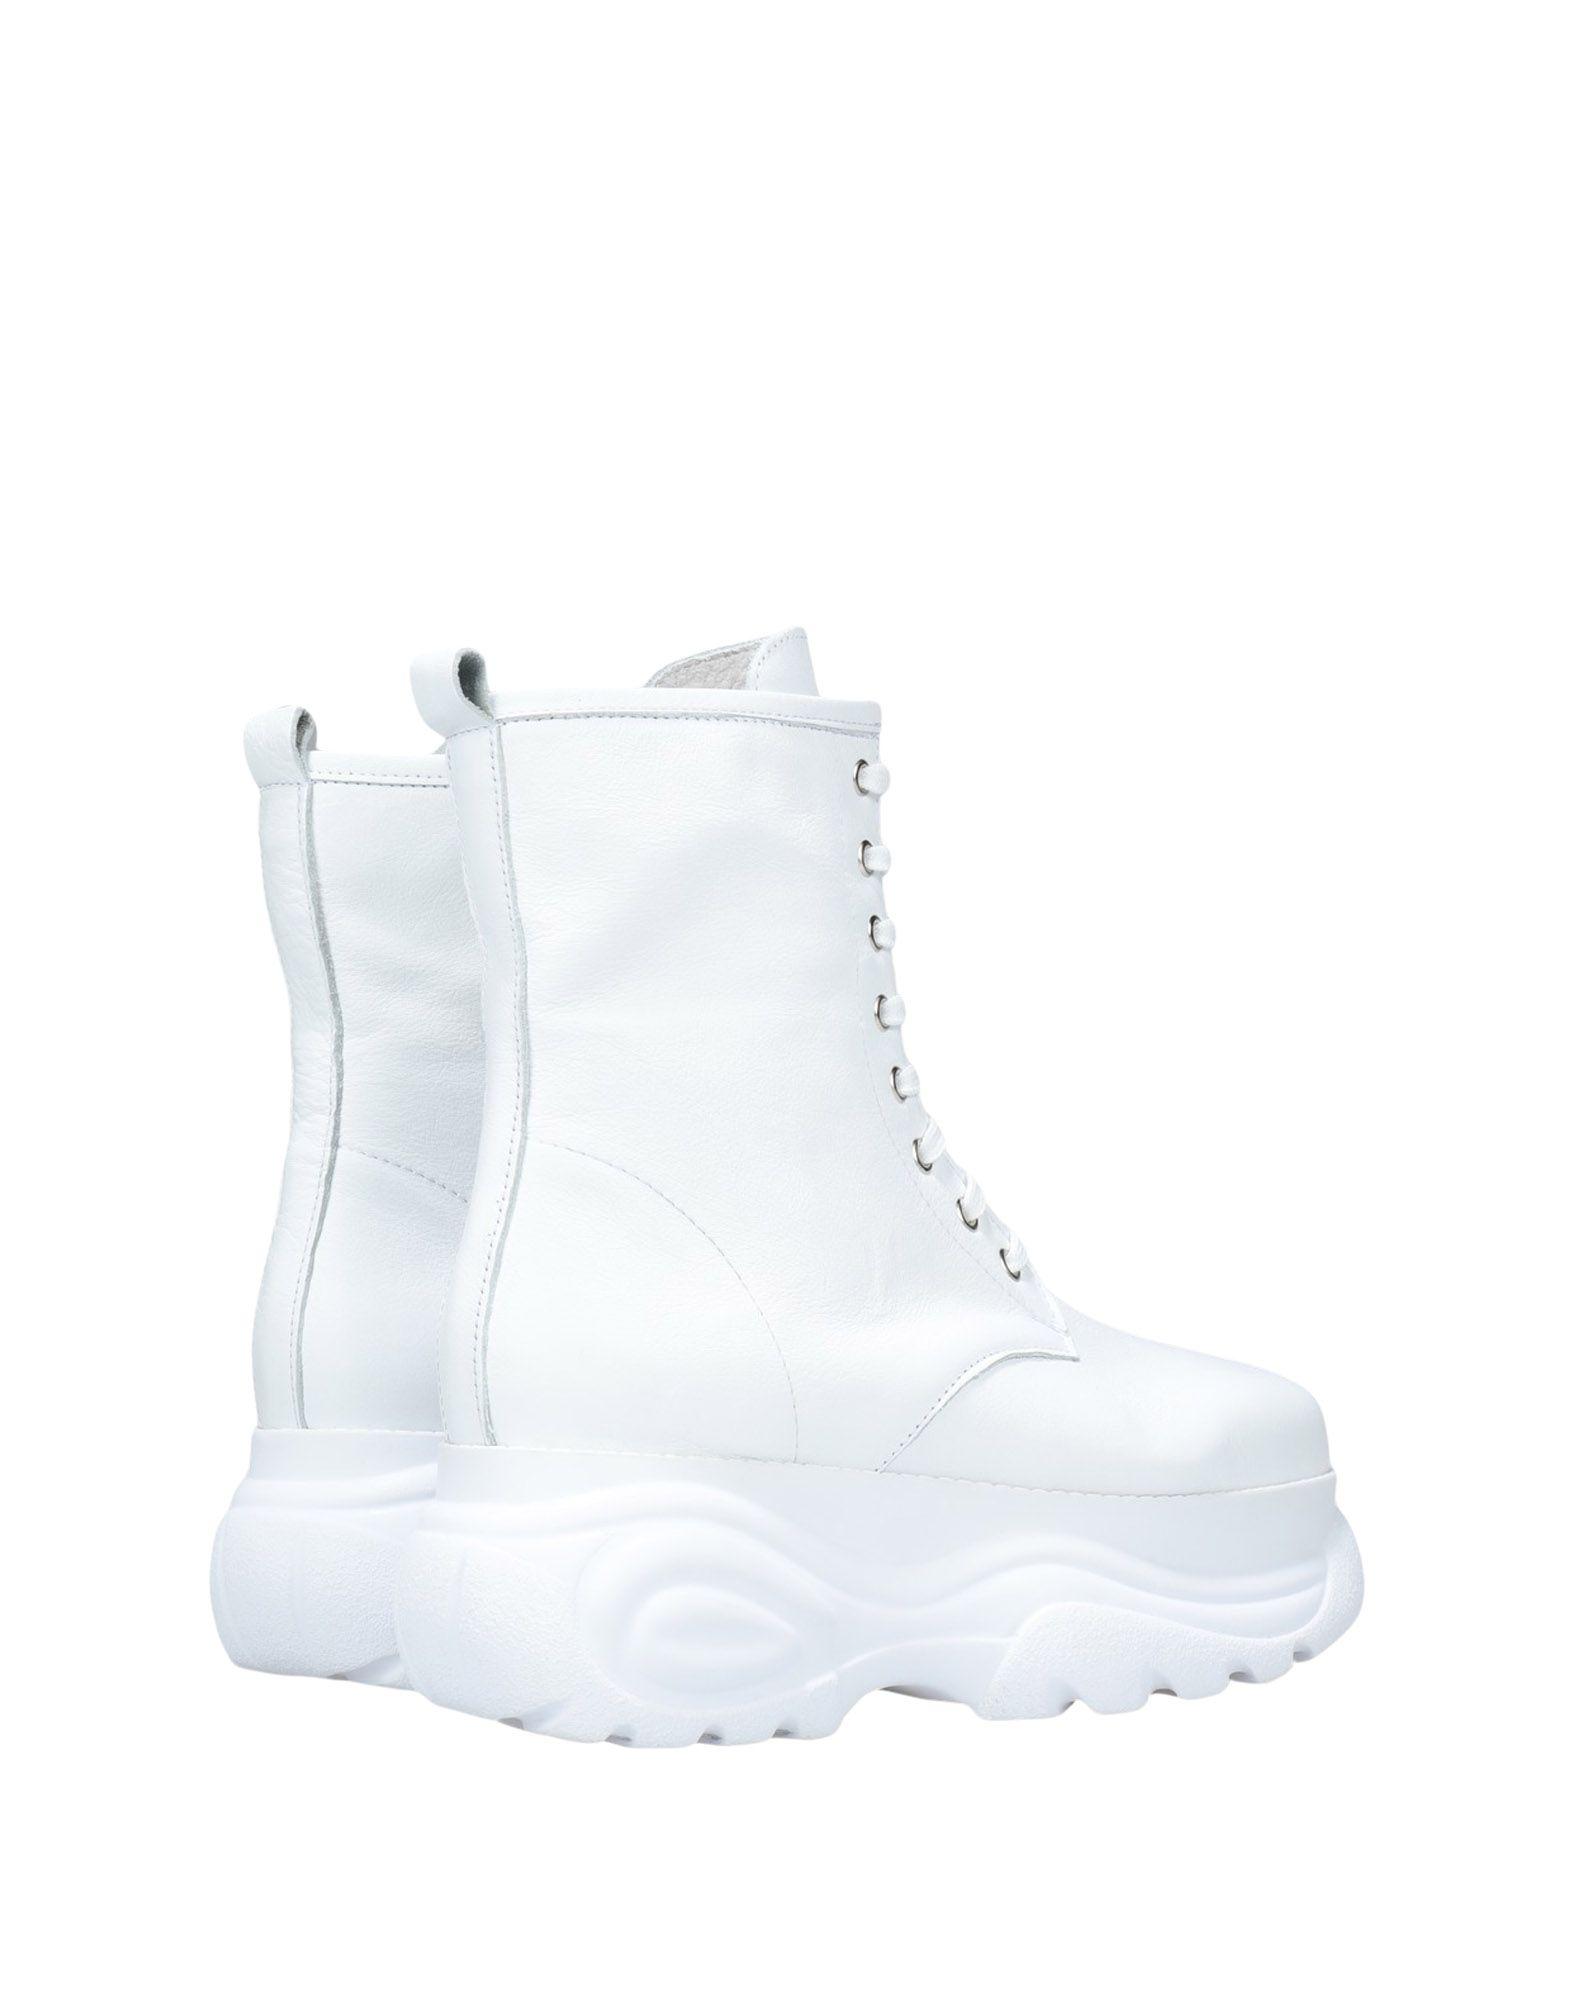 Gut um Darré billige Schuhe zu tragenPierre Darré um Stiefelette Damen  11530681AM 0fe22f